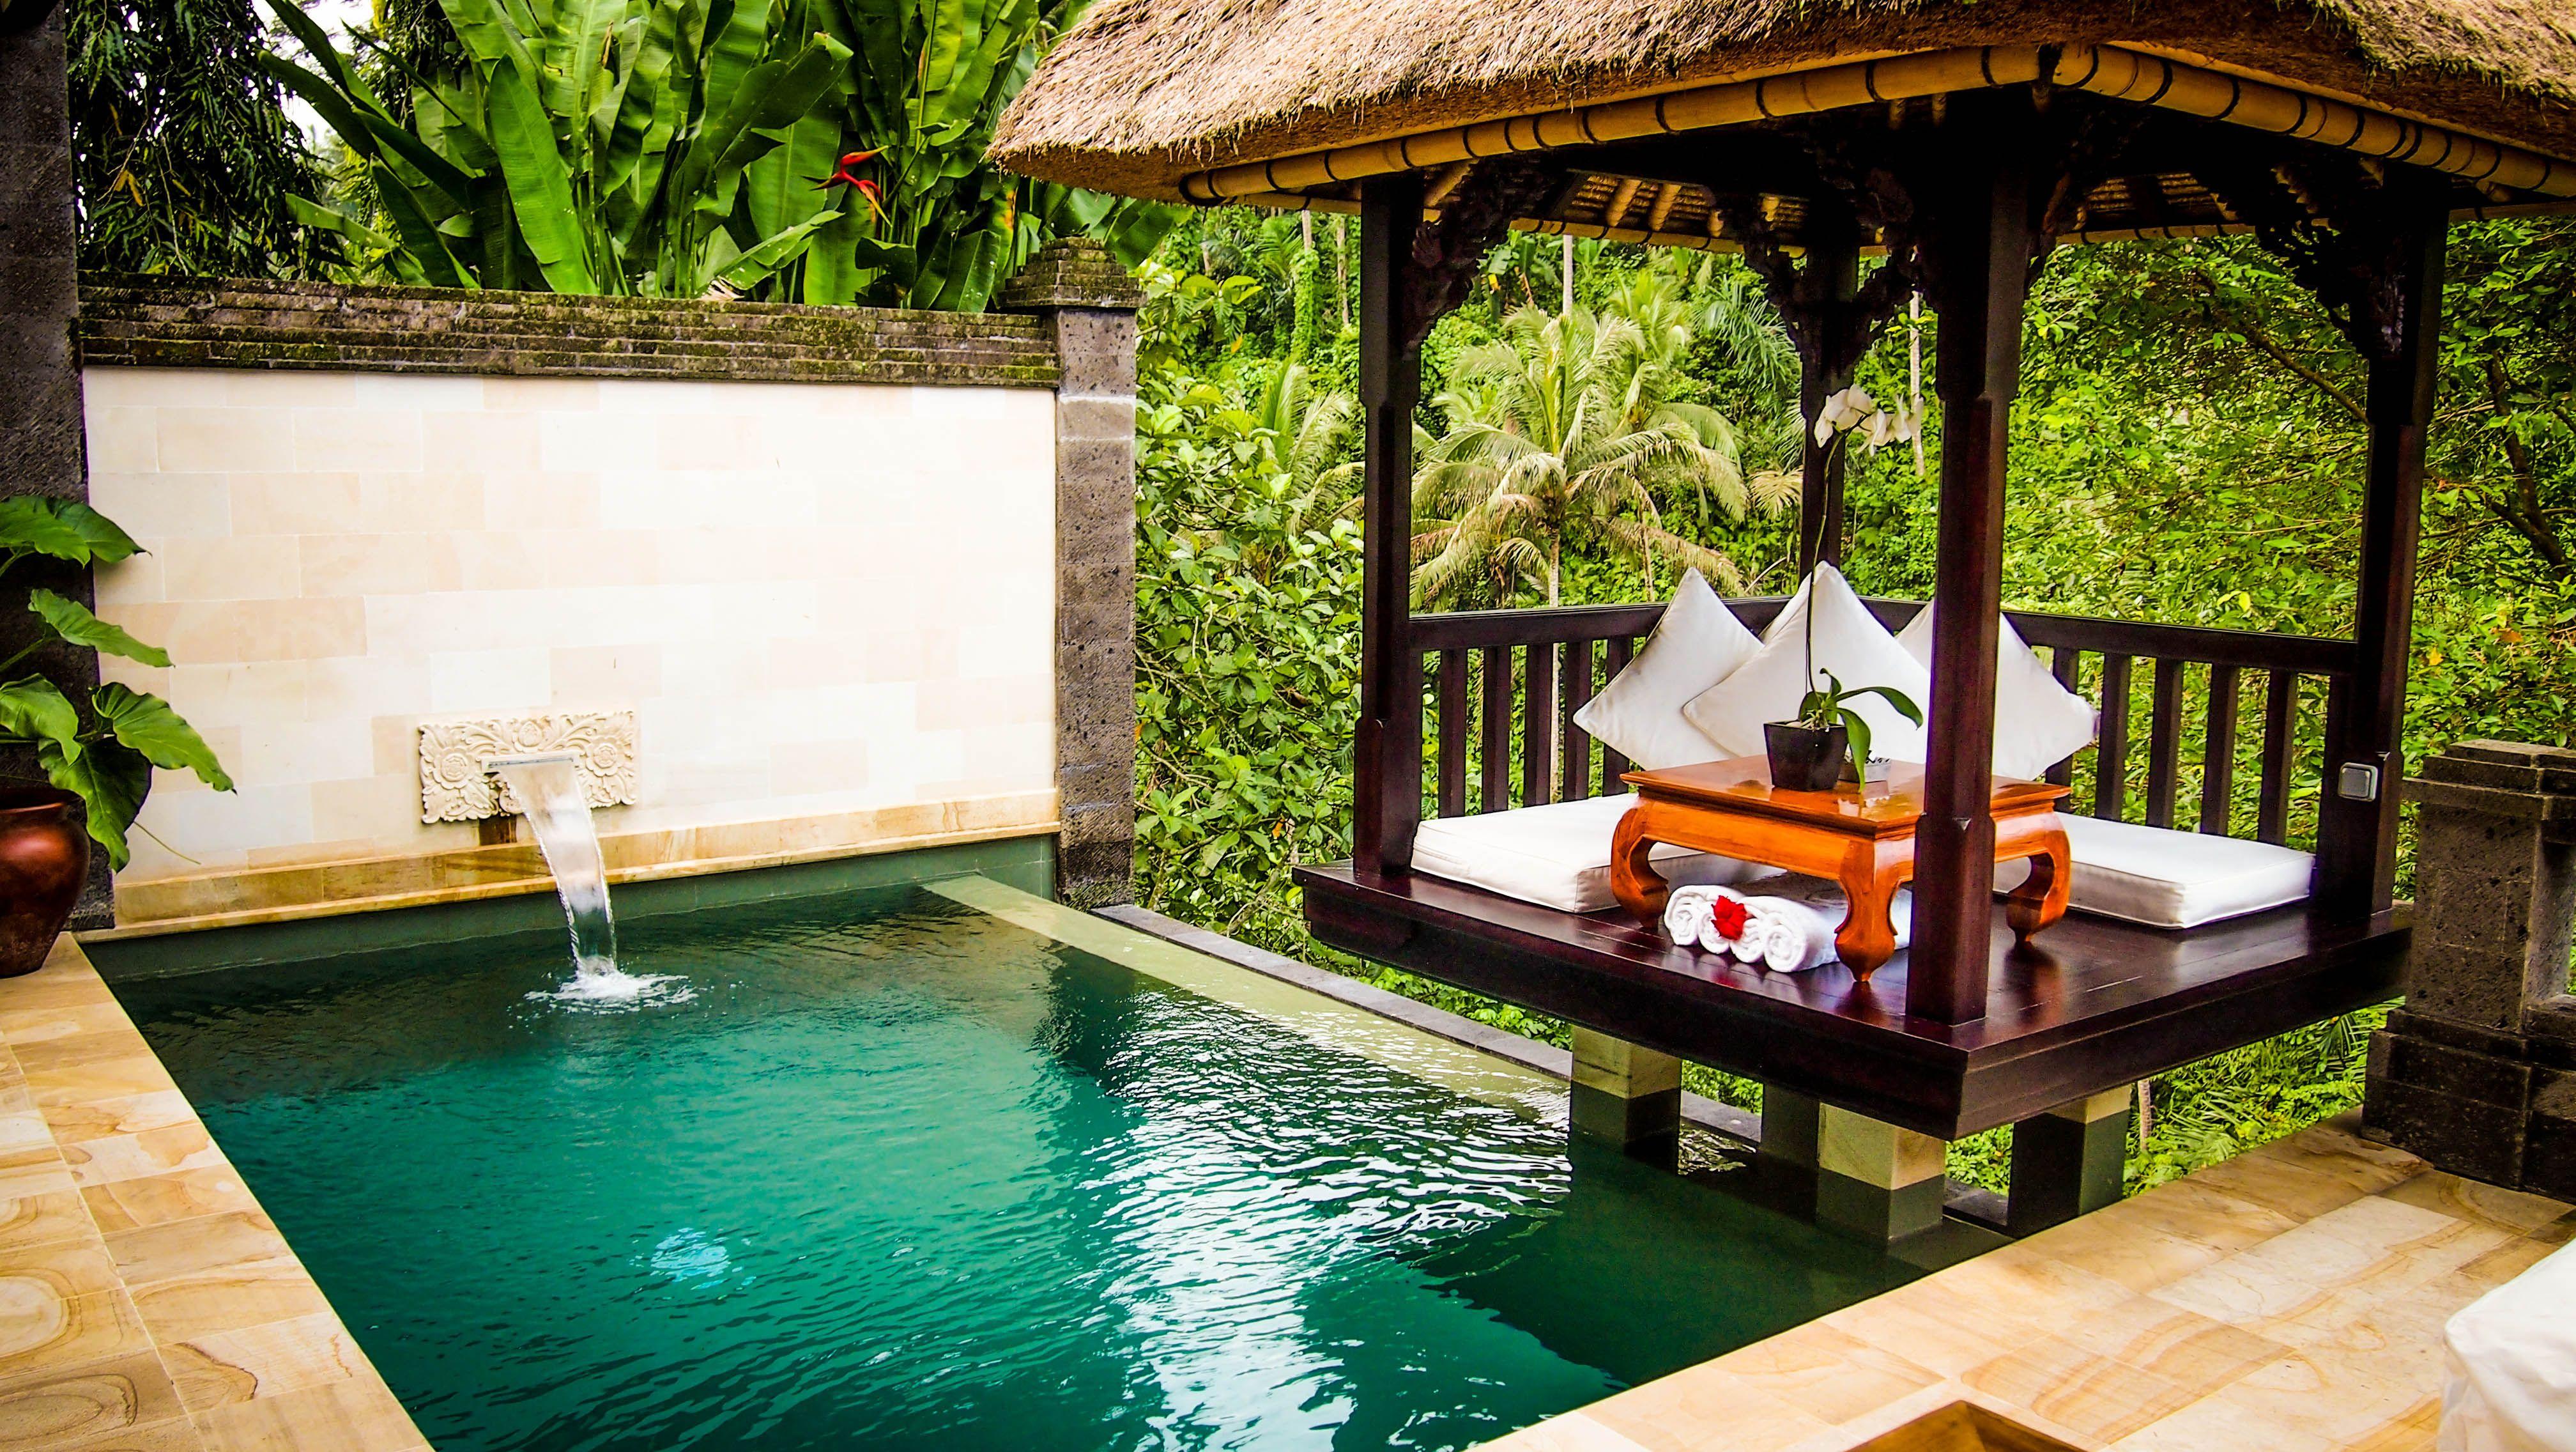 Japanese pool patio ideas Gardens Pinterest